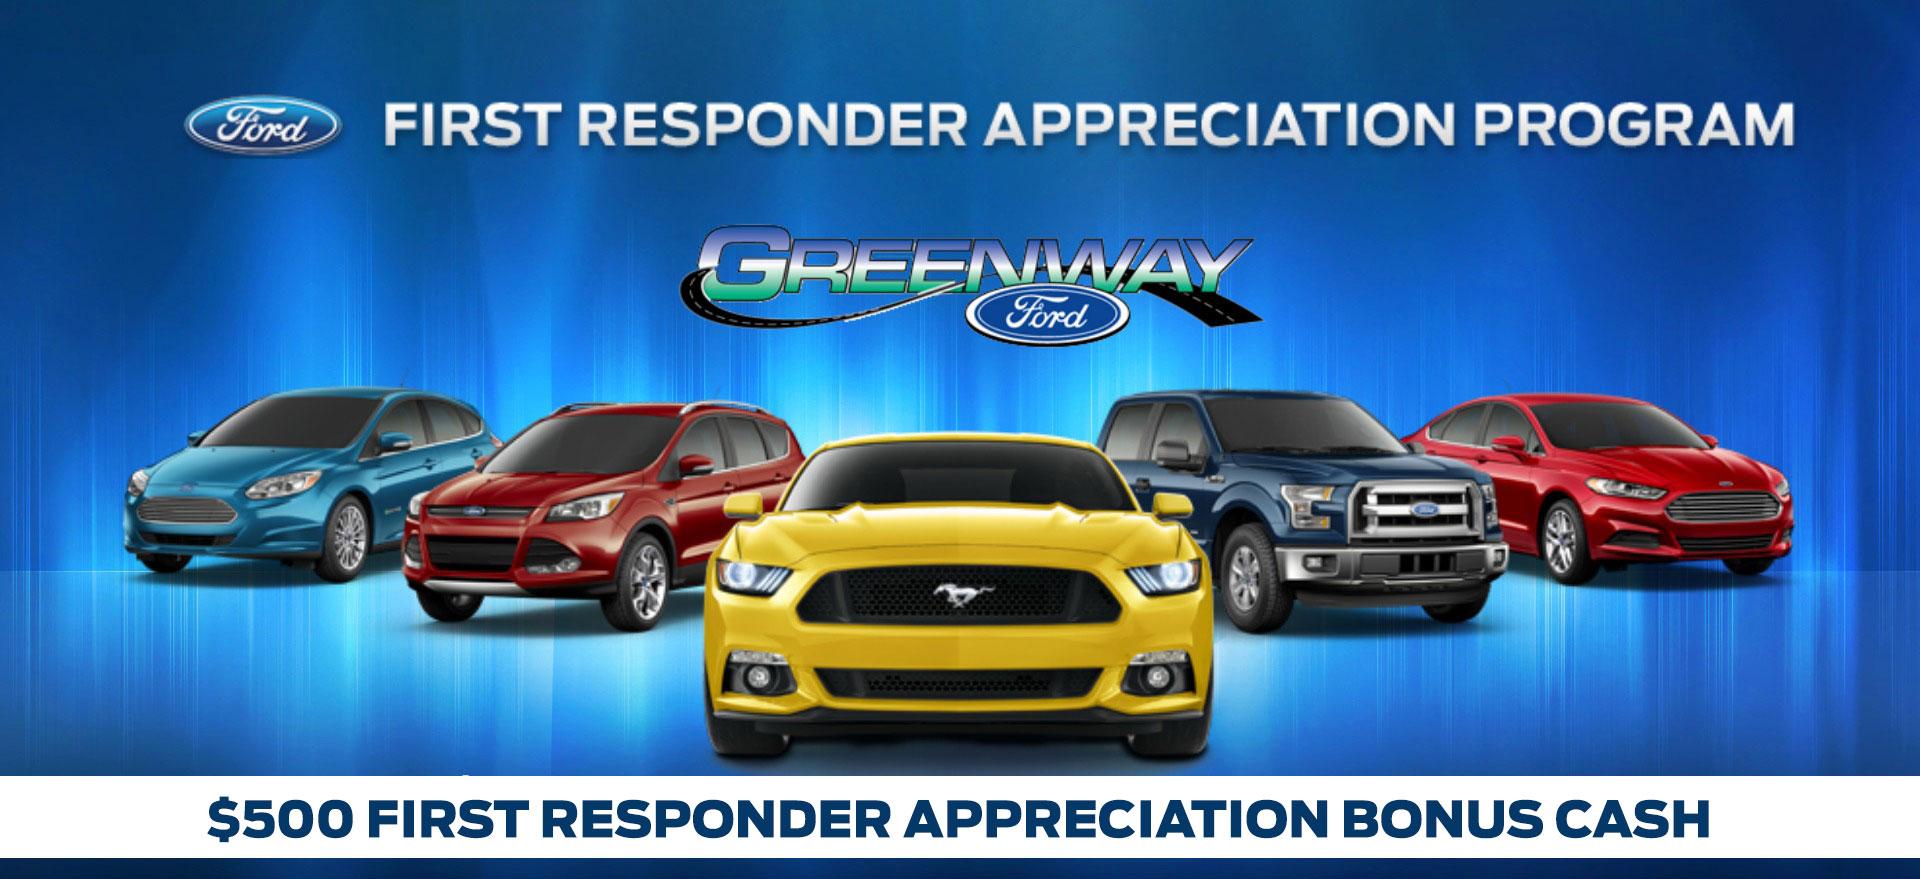 $500 First responder car program from Greenway Ford in Orlando FL